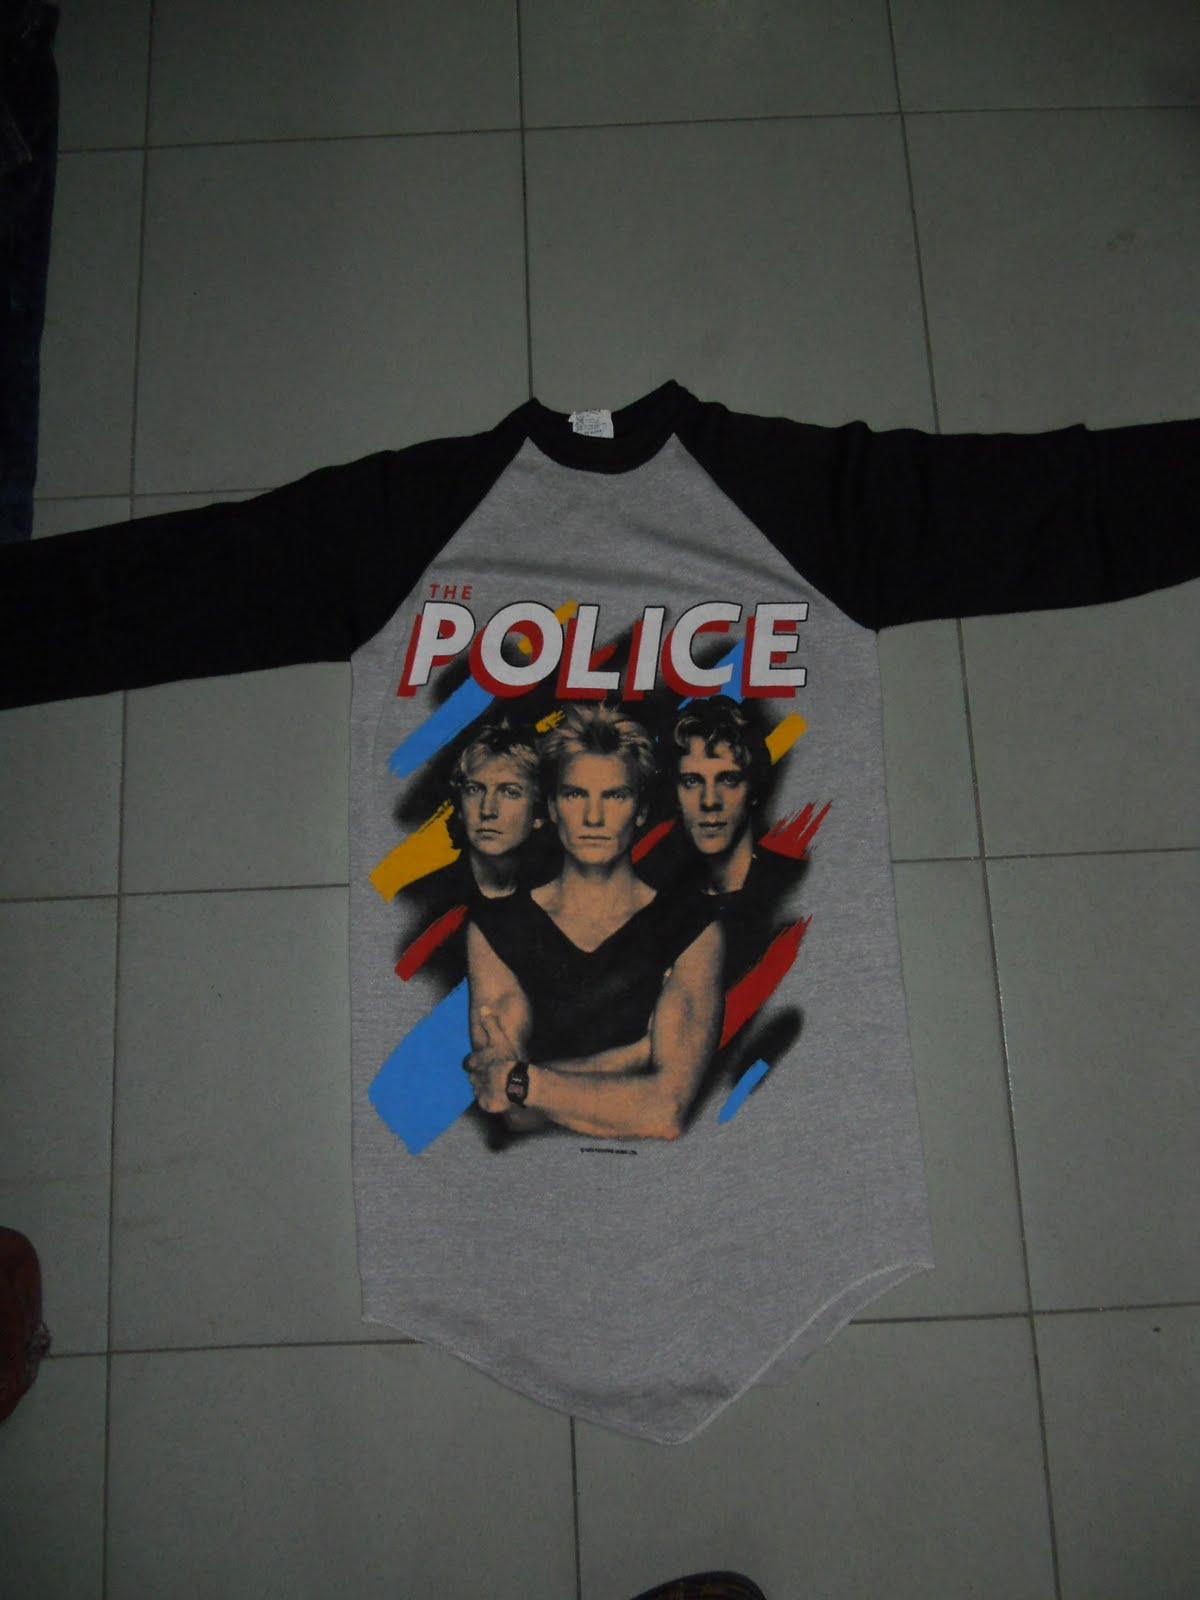 Daftar Harga Tendencies Tshirt Punk Rock Hitam S Update 2018 Emba Jeans Inoray Jacket Warna Stone Tembaga Xl Trend Bundle August 2011 Vtg The Police Band 83 50